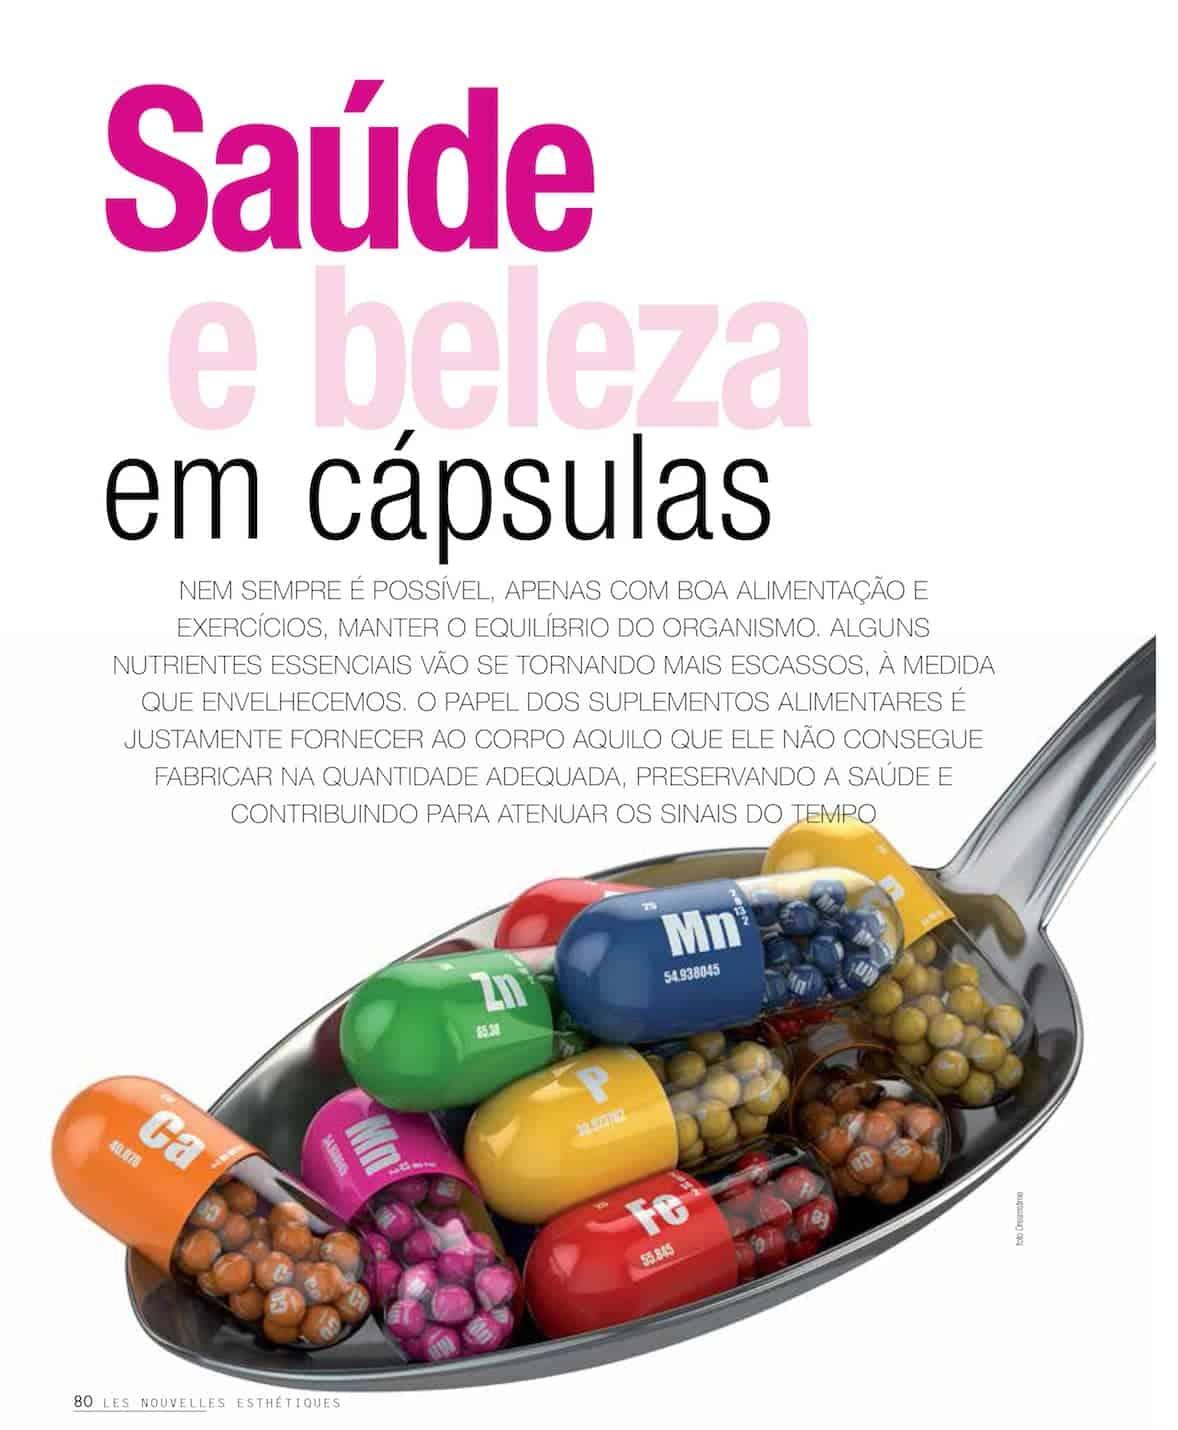 saude-beleza_1